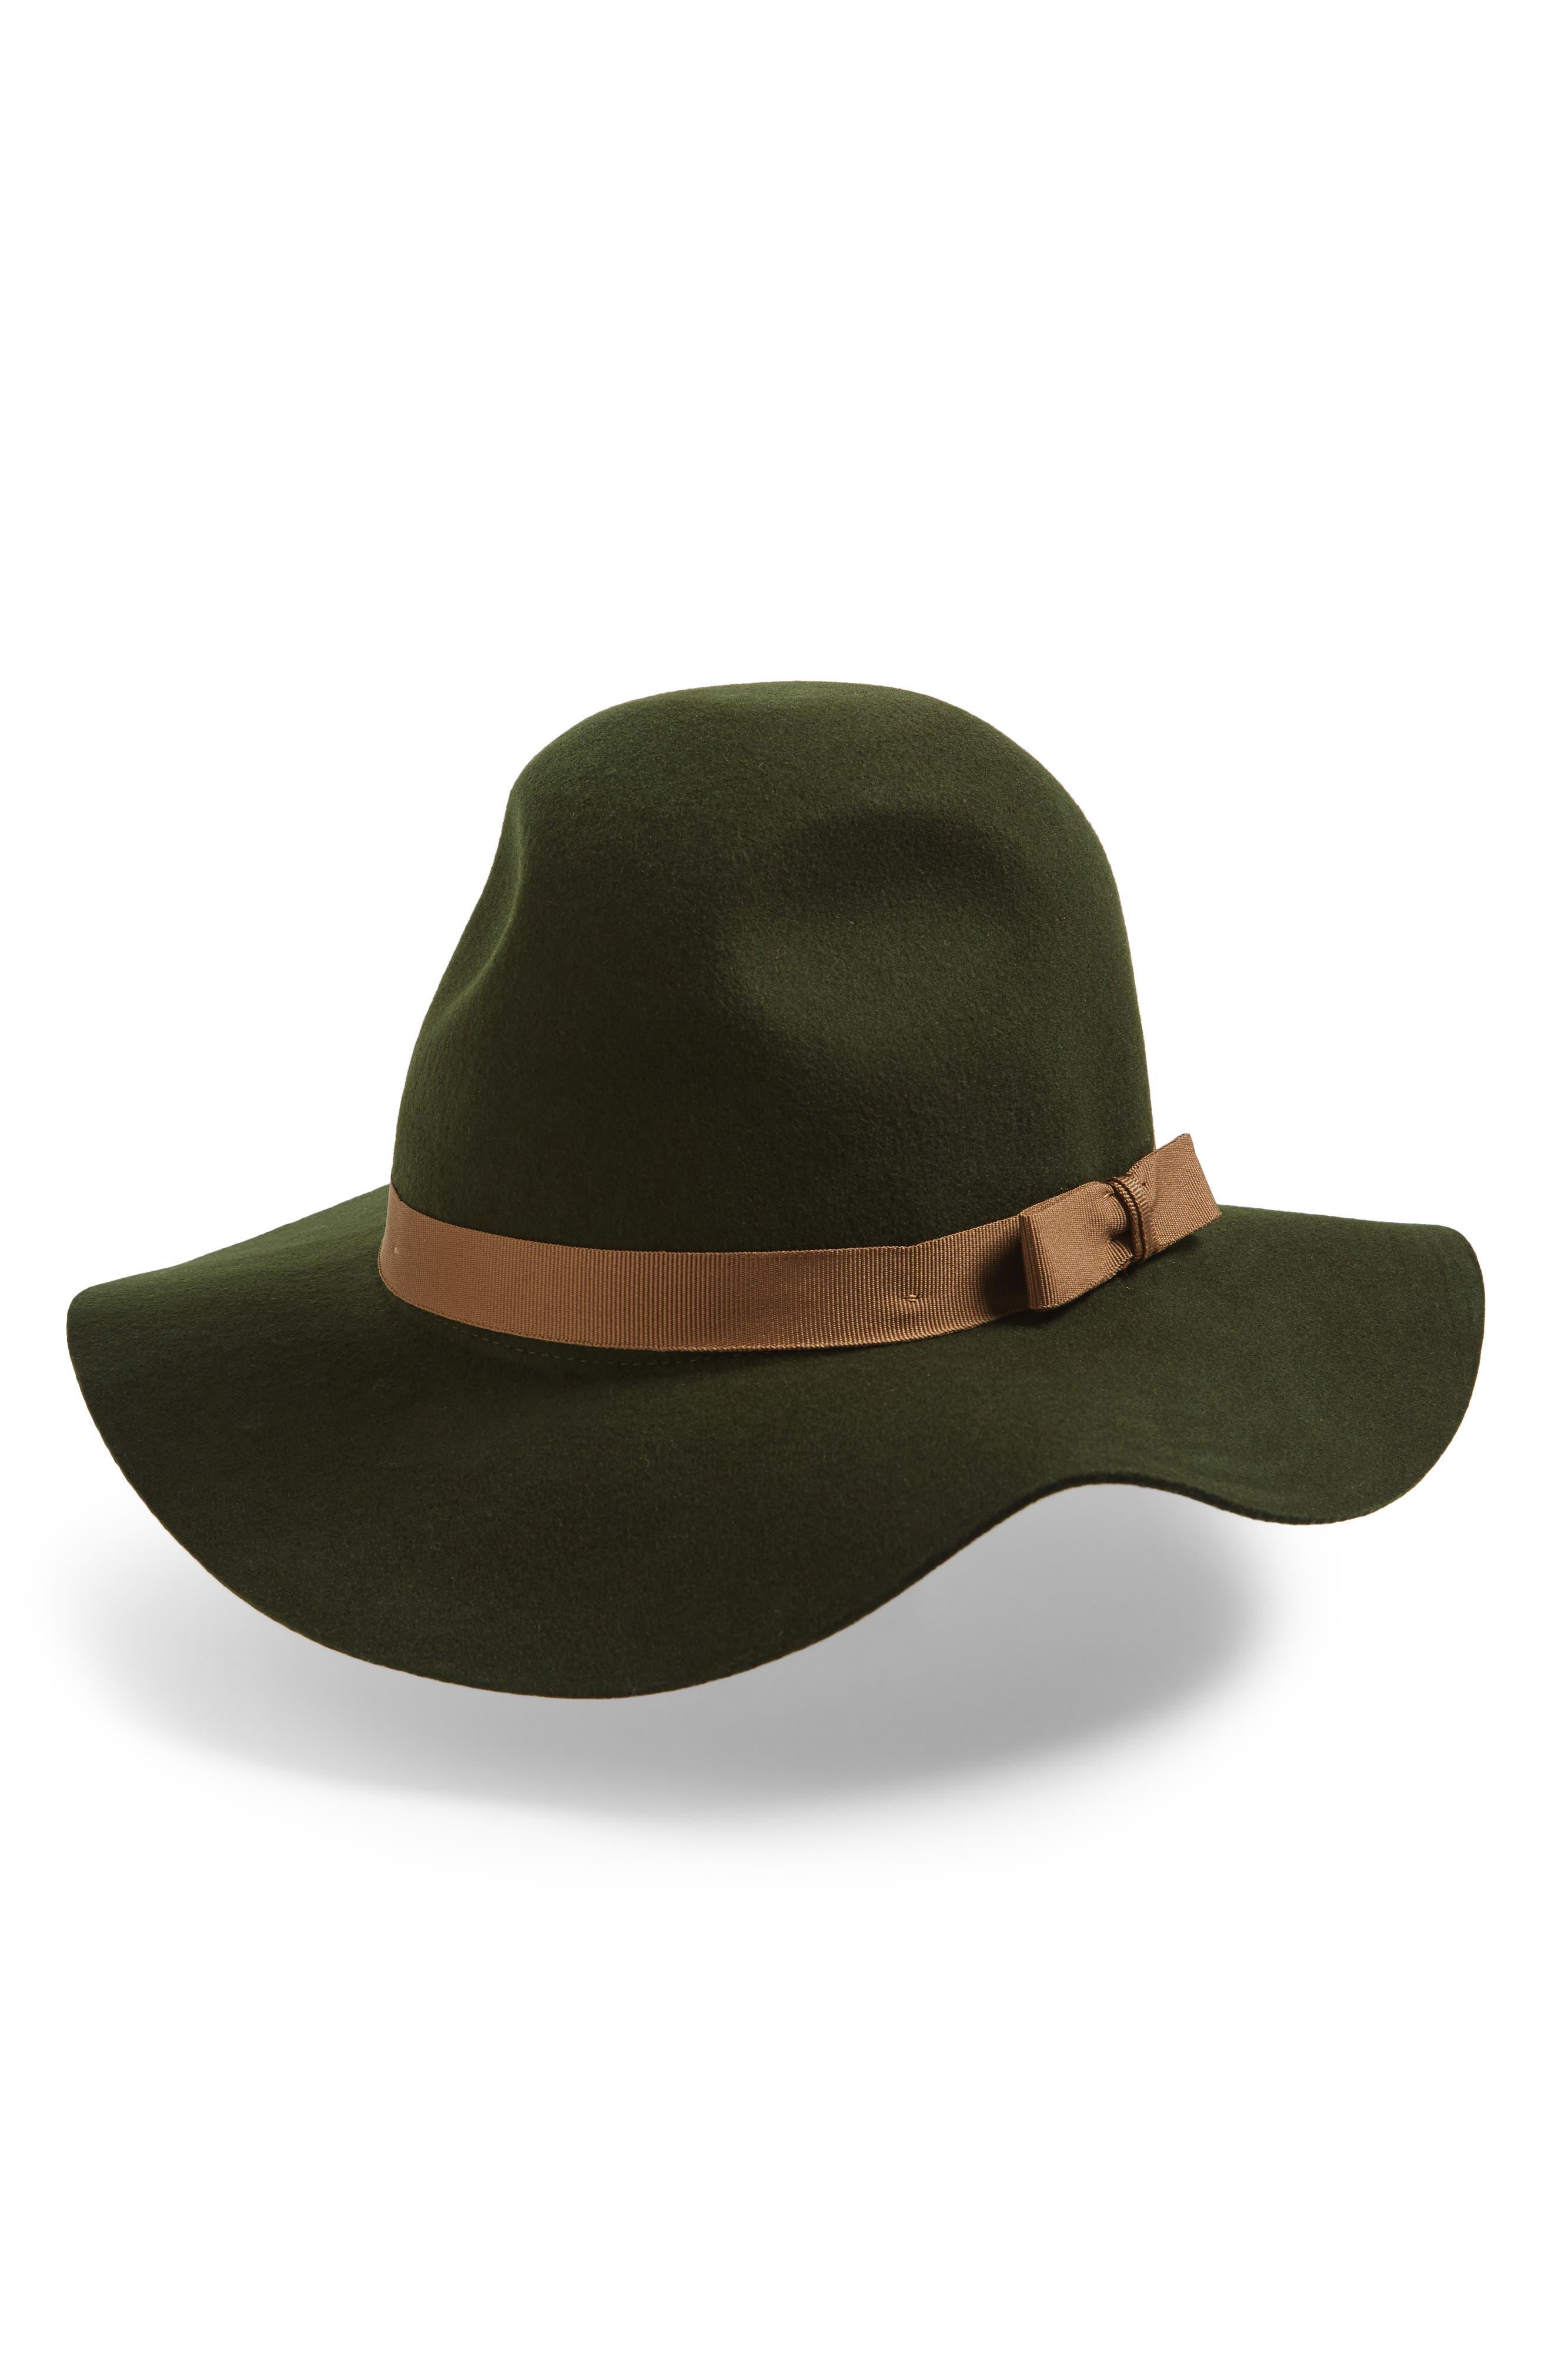 'Dalila' Floppy Felt Hat,                         Main,                         color,